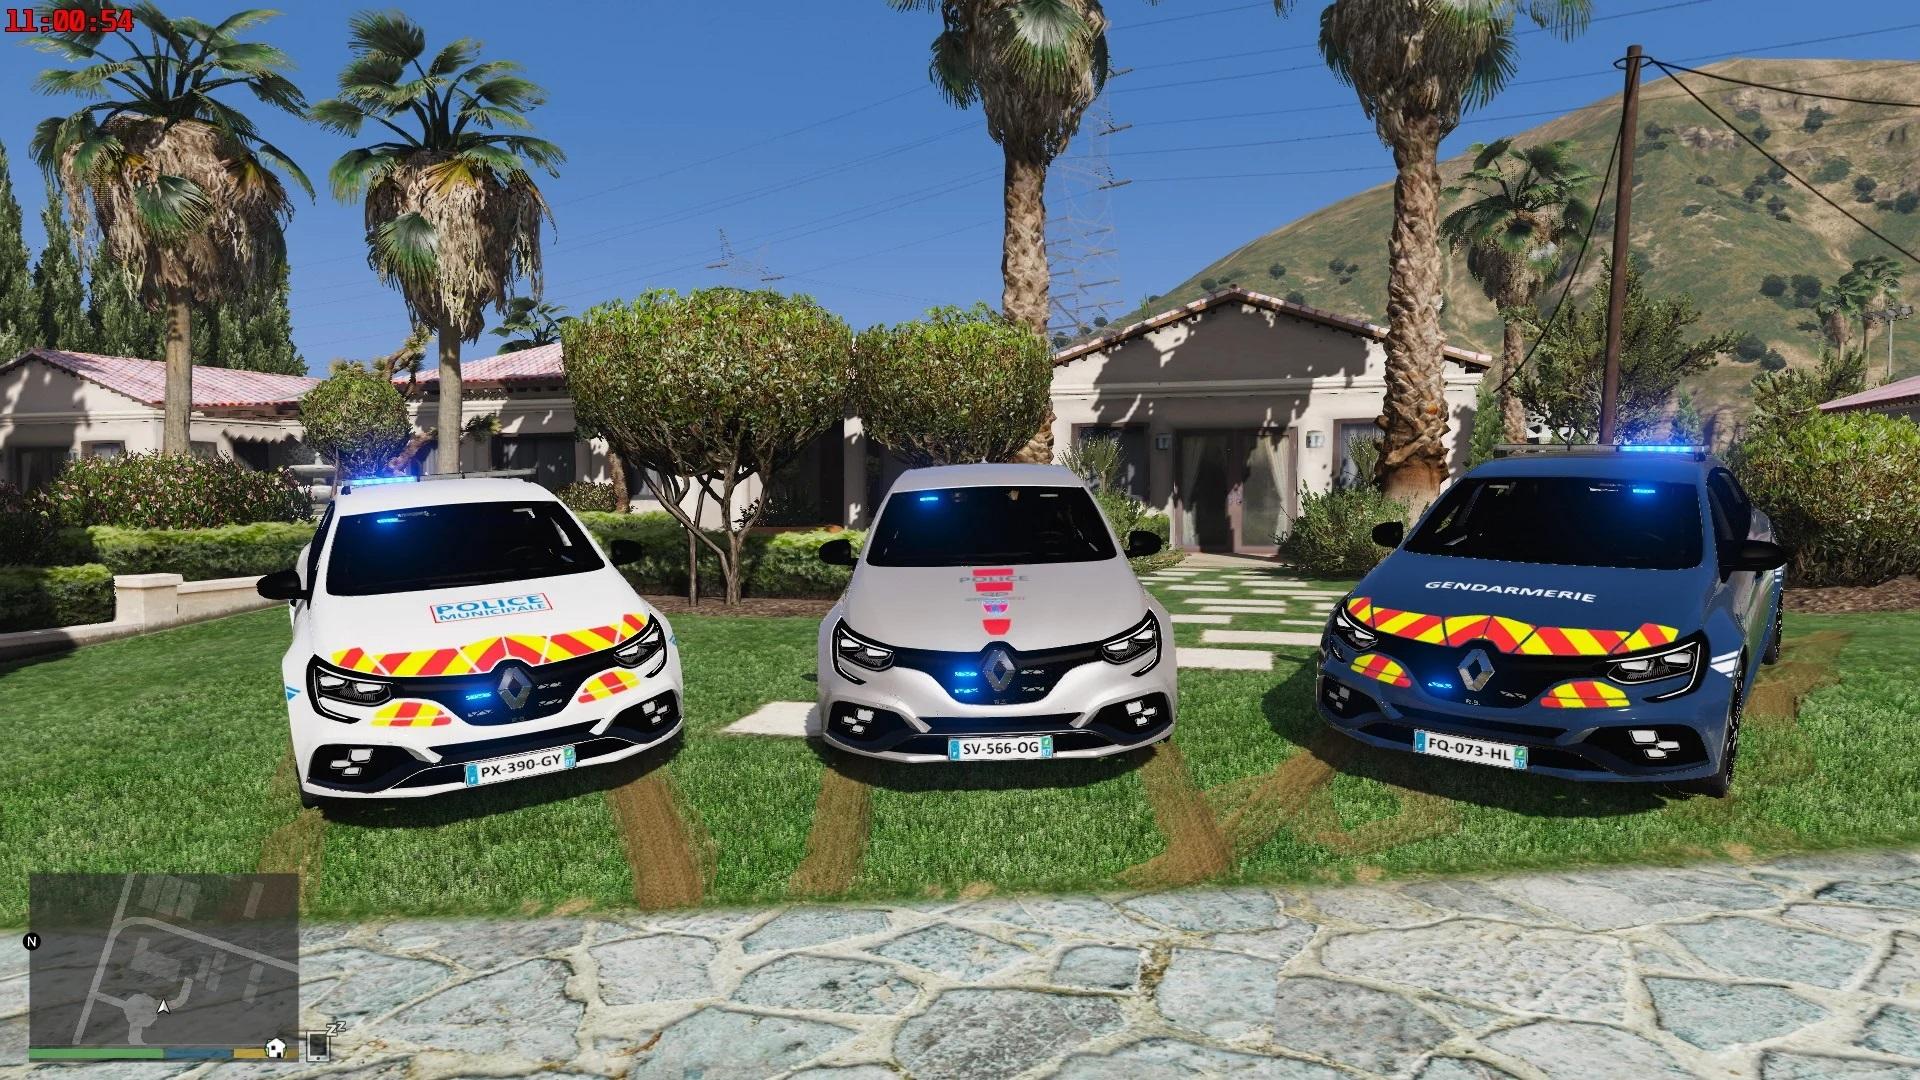 Renault megane RS trophy French gendarmerie and police [noELS-ELS]